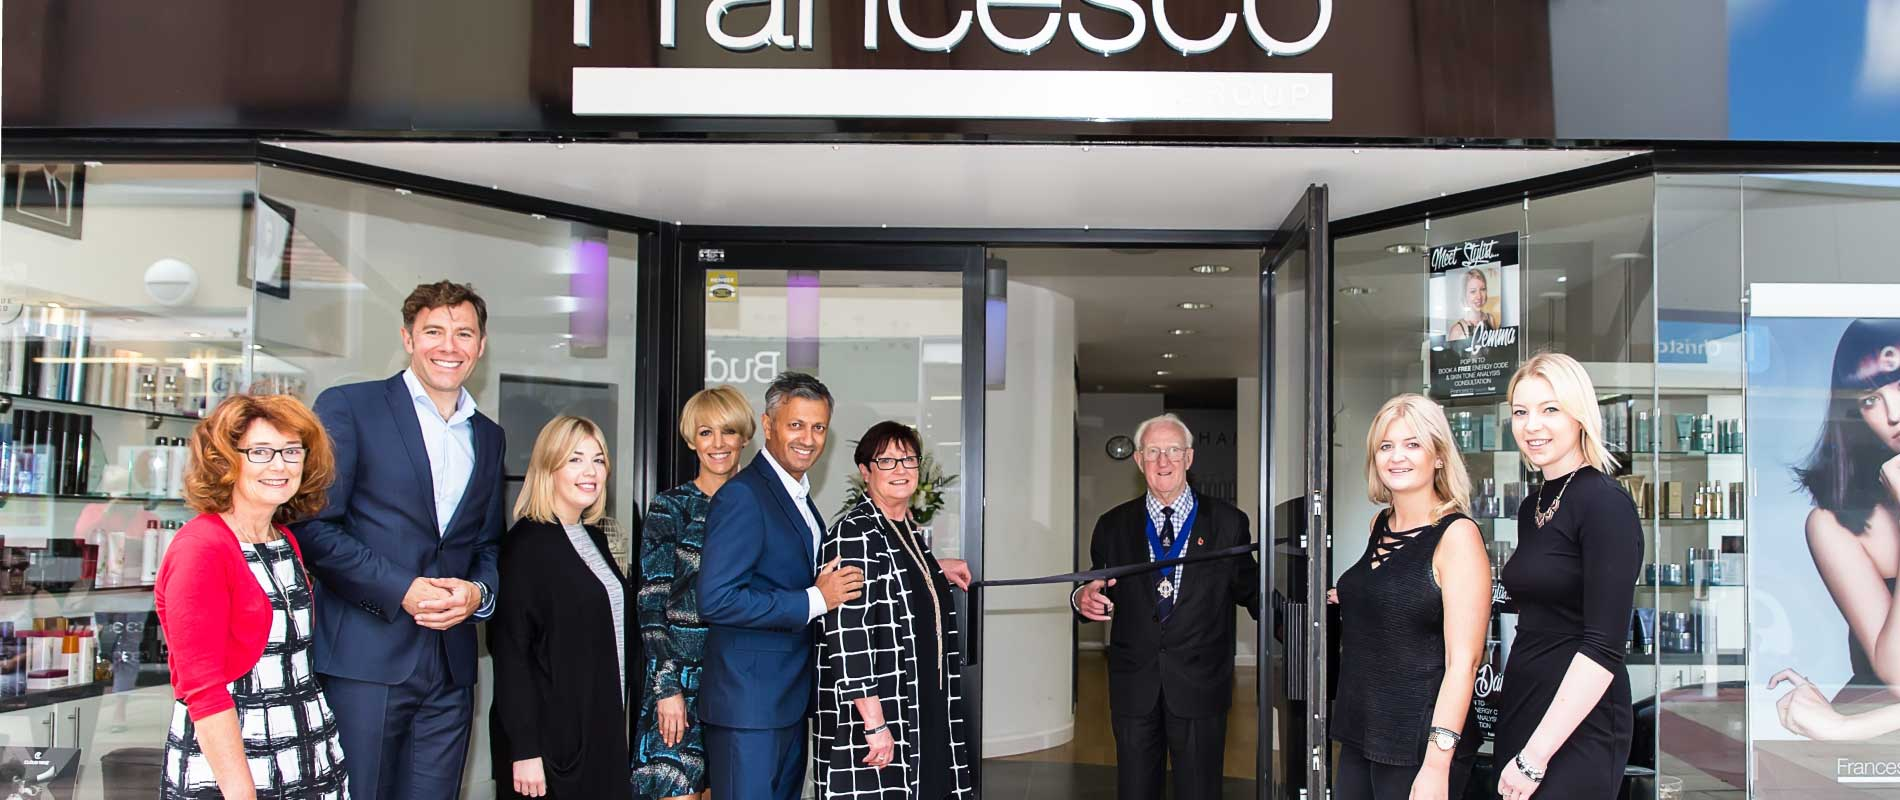 Francesco Group Christchurch